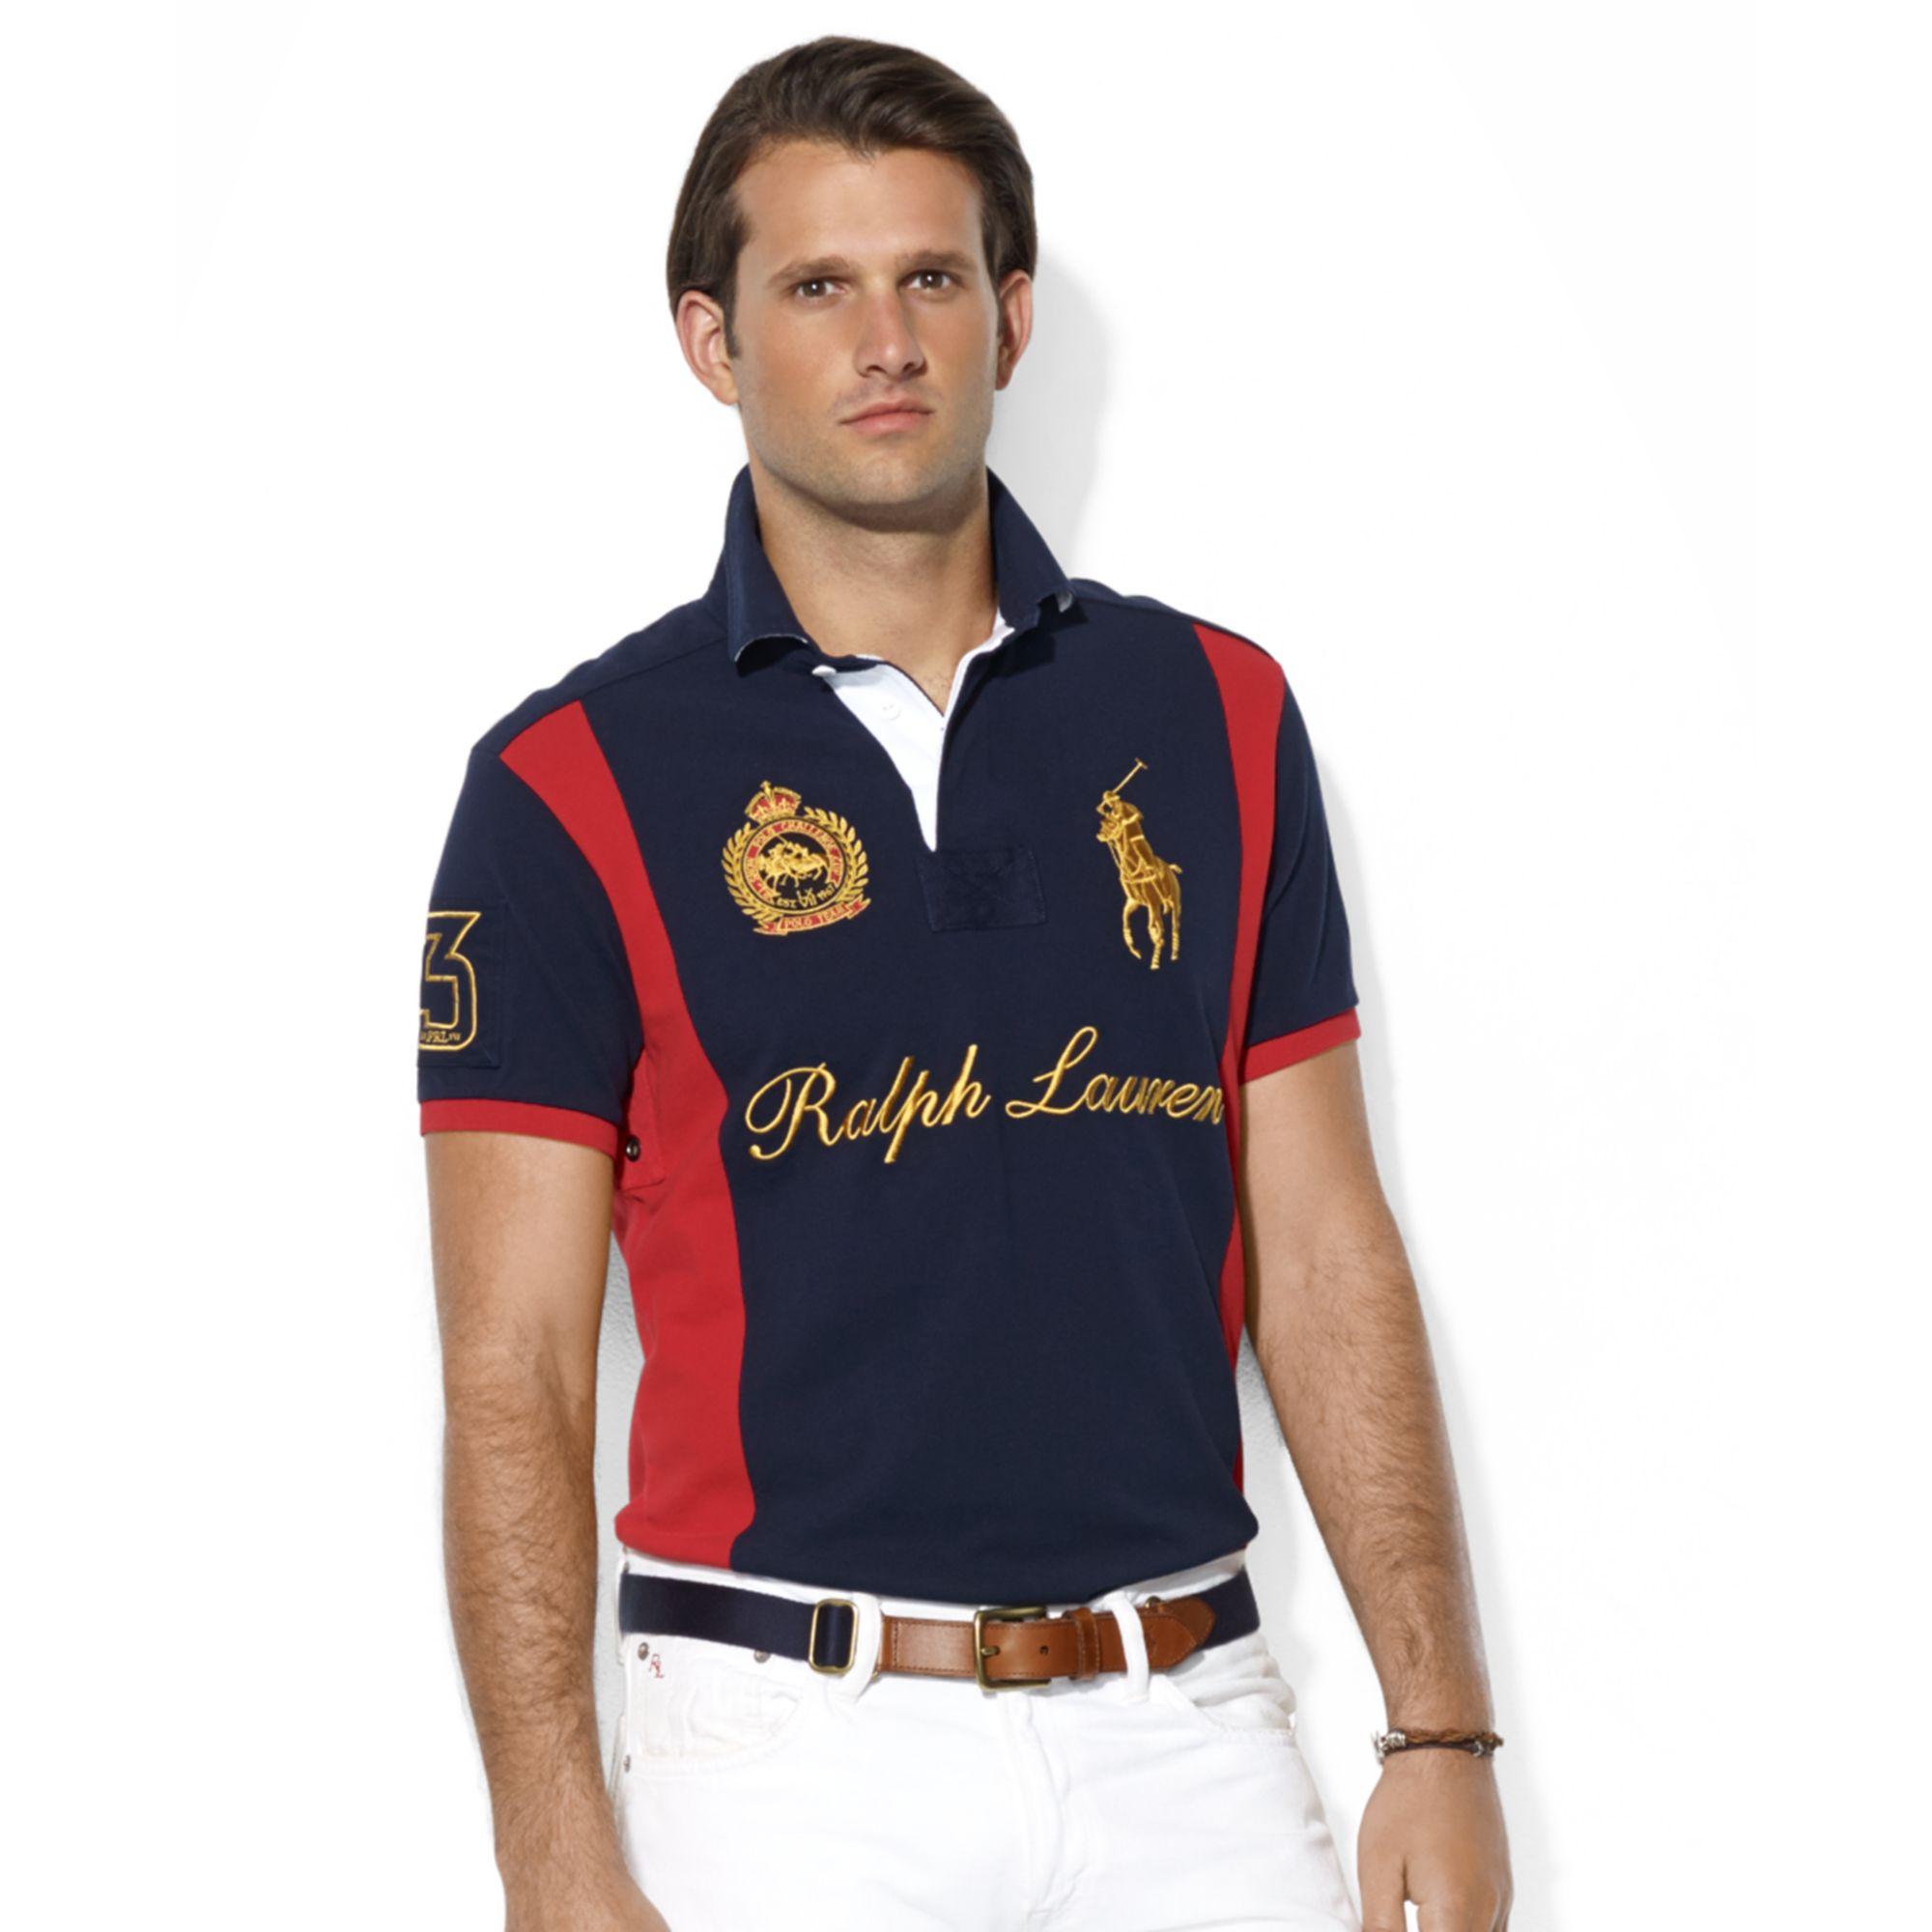 ee66a2f9 ... discount lyst ralph lauren custom fit prl club rugby collar short  sleeve b564b 616ce